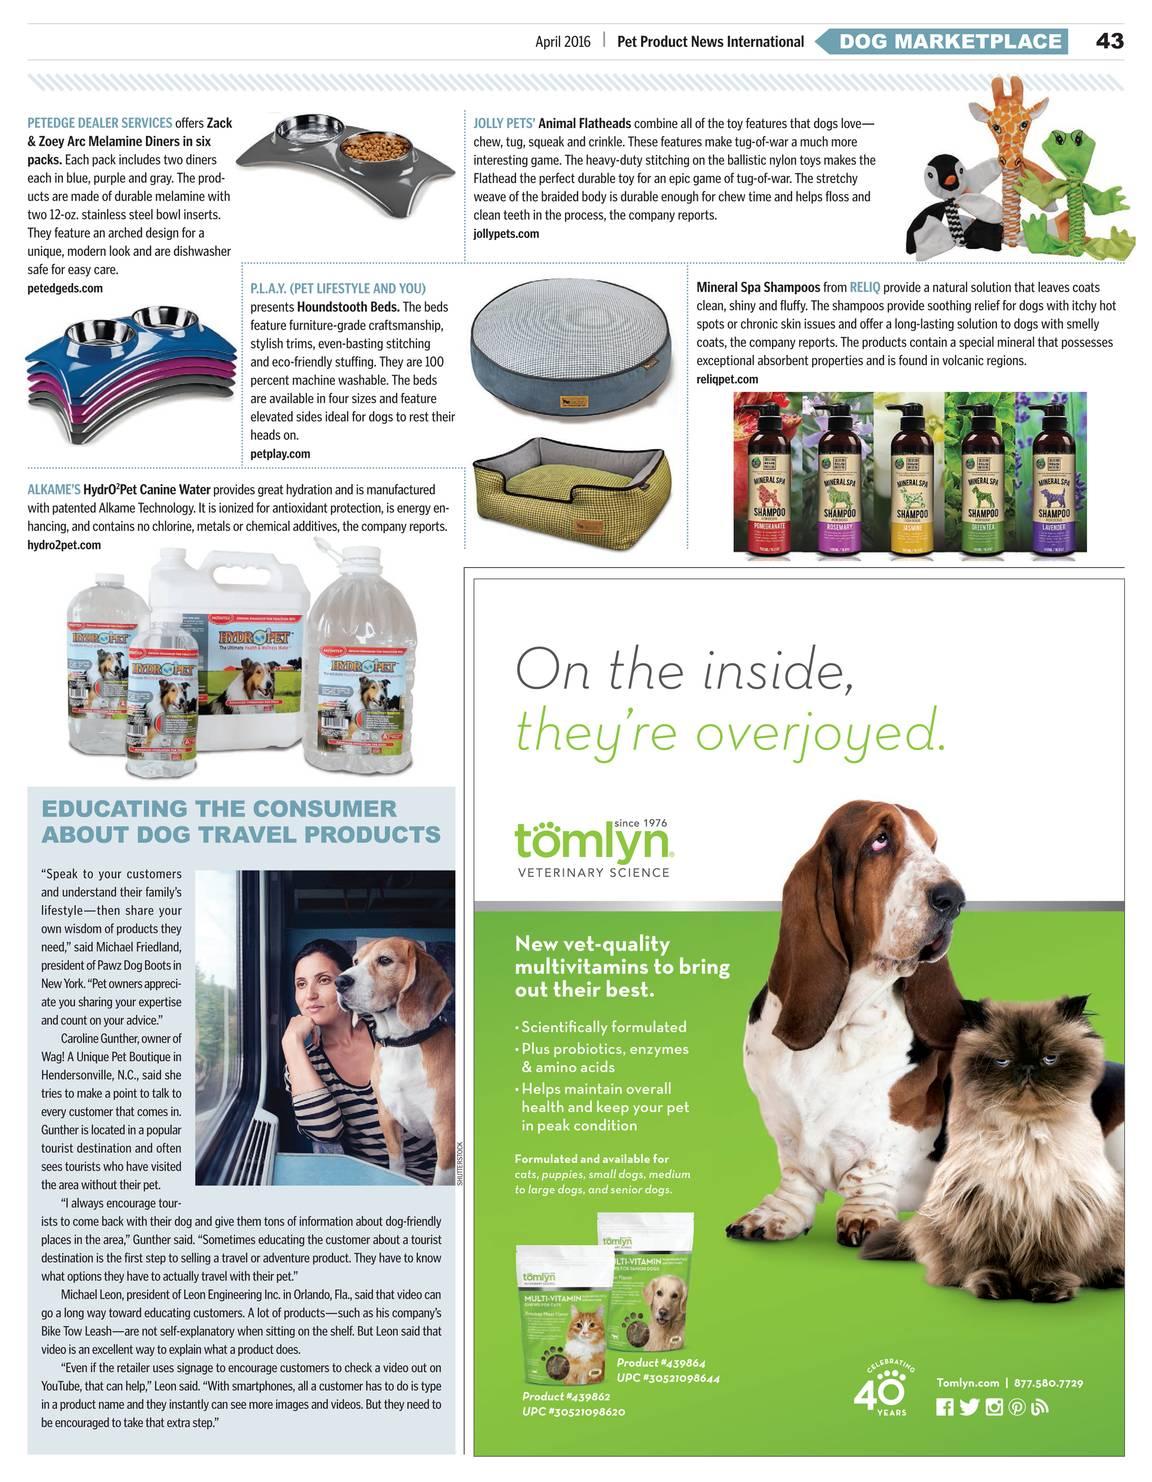 Pet Product News - April 2016 - page 44